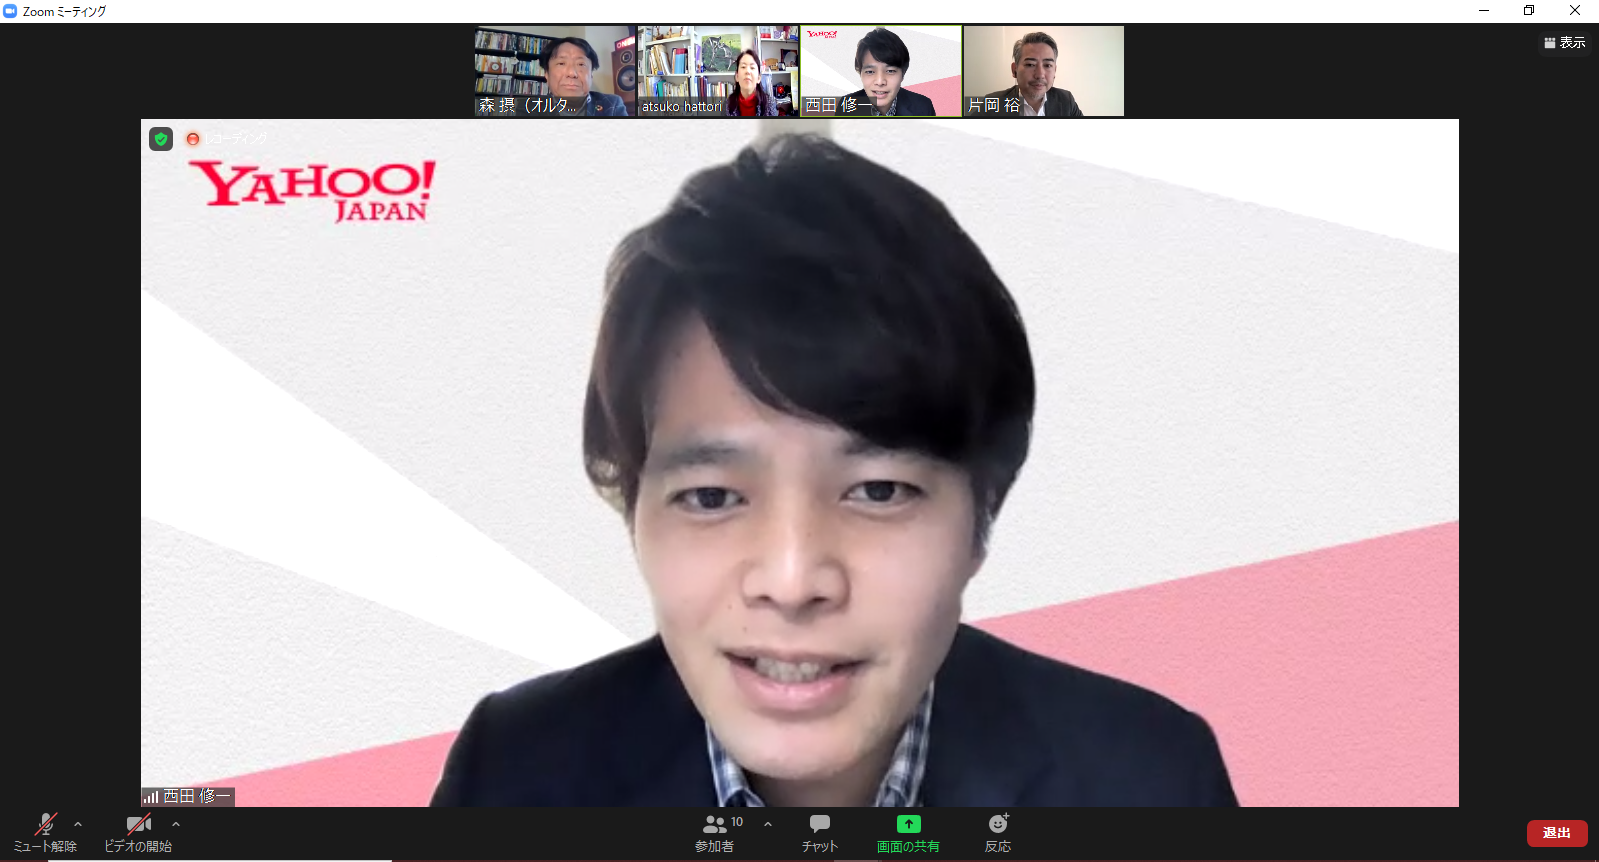 Shuichi Nishida speaking at a ZOOM interview